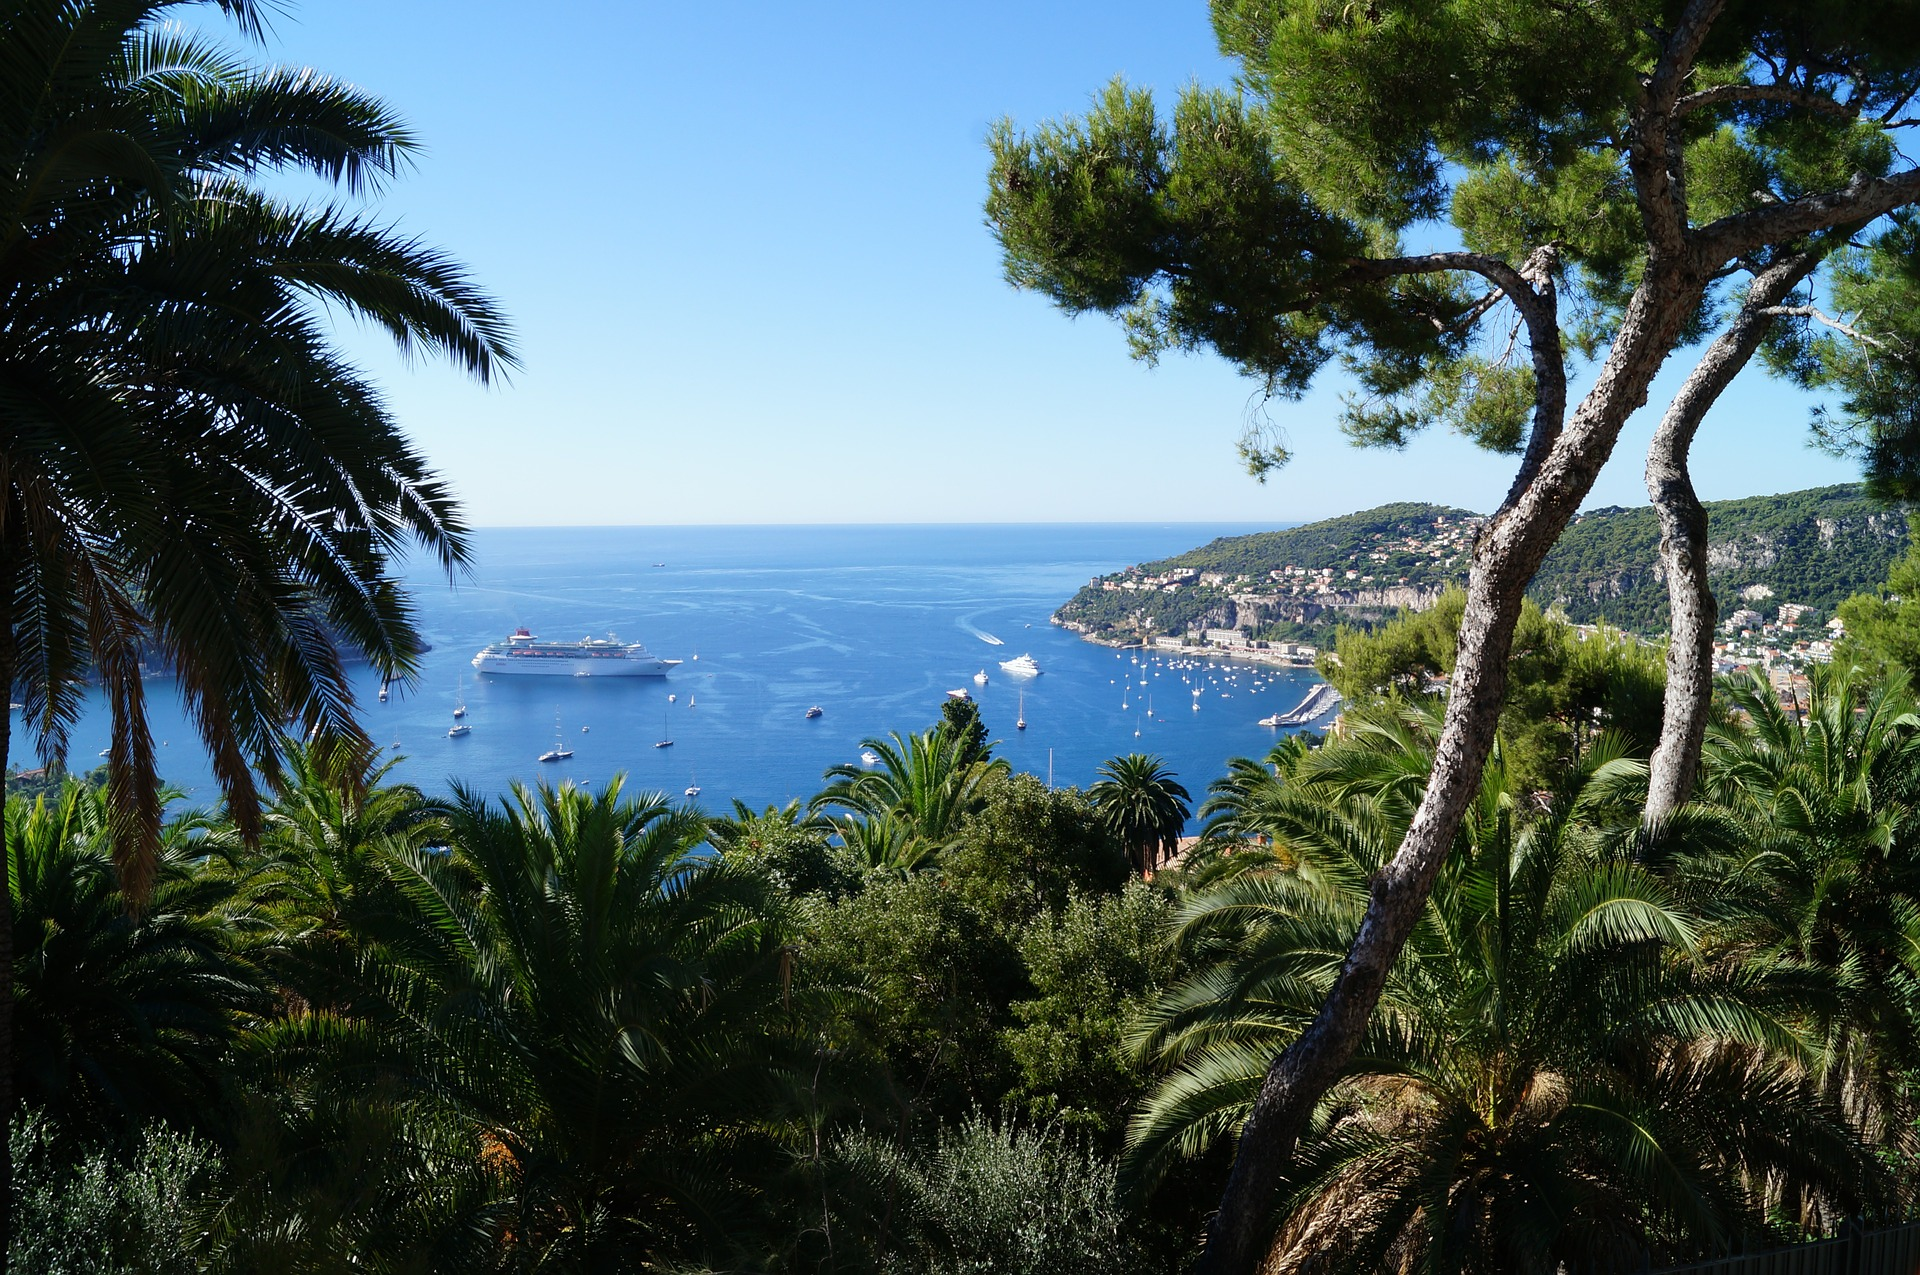 Life at Côte d'Azur